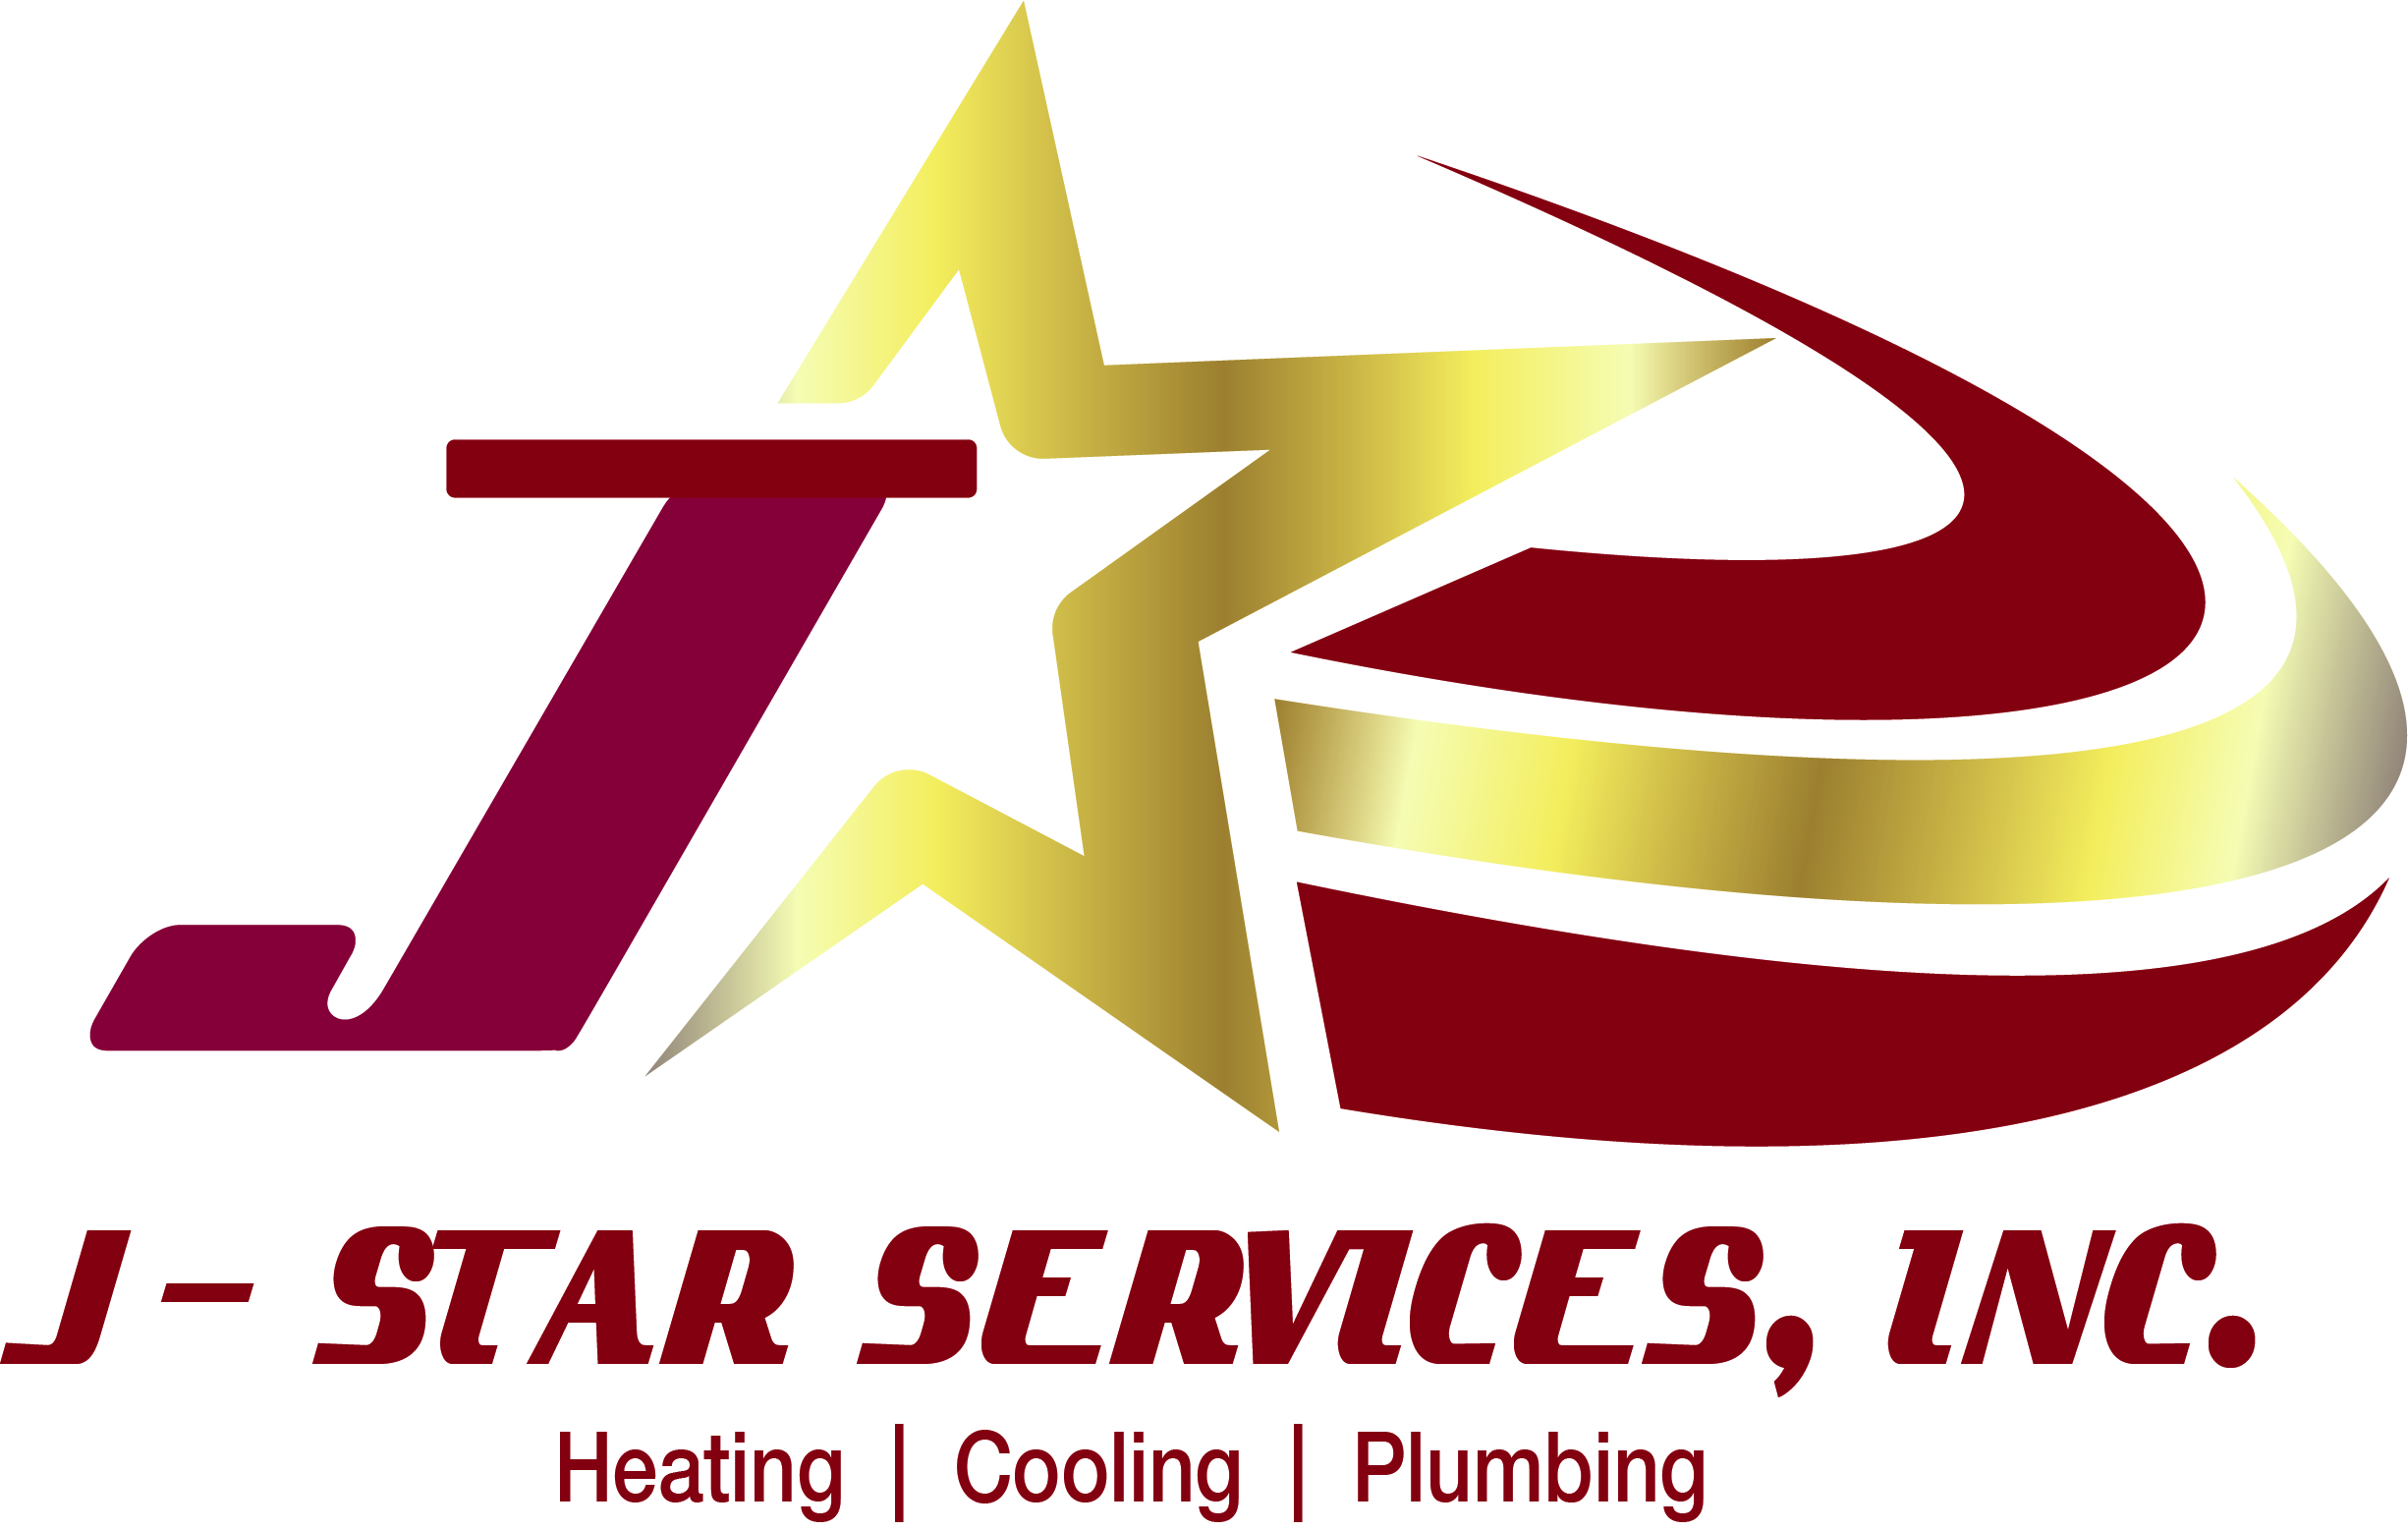 J-Star Services